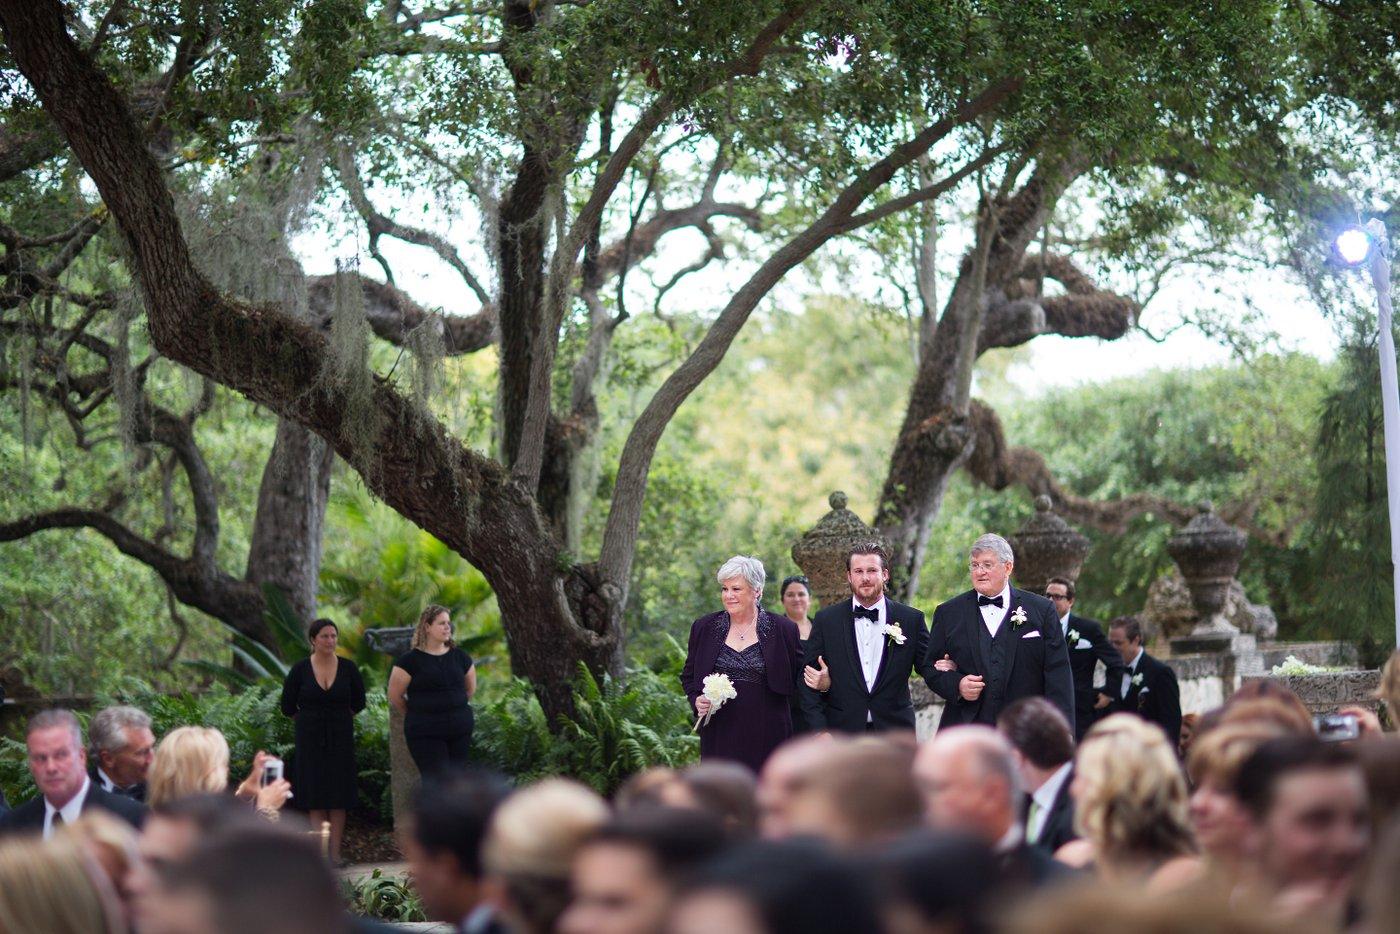 vizcaya ceremony photos miami, best wedding photographer miami, otto haring